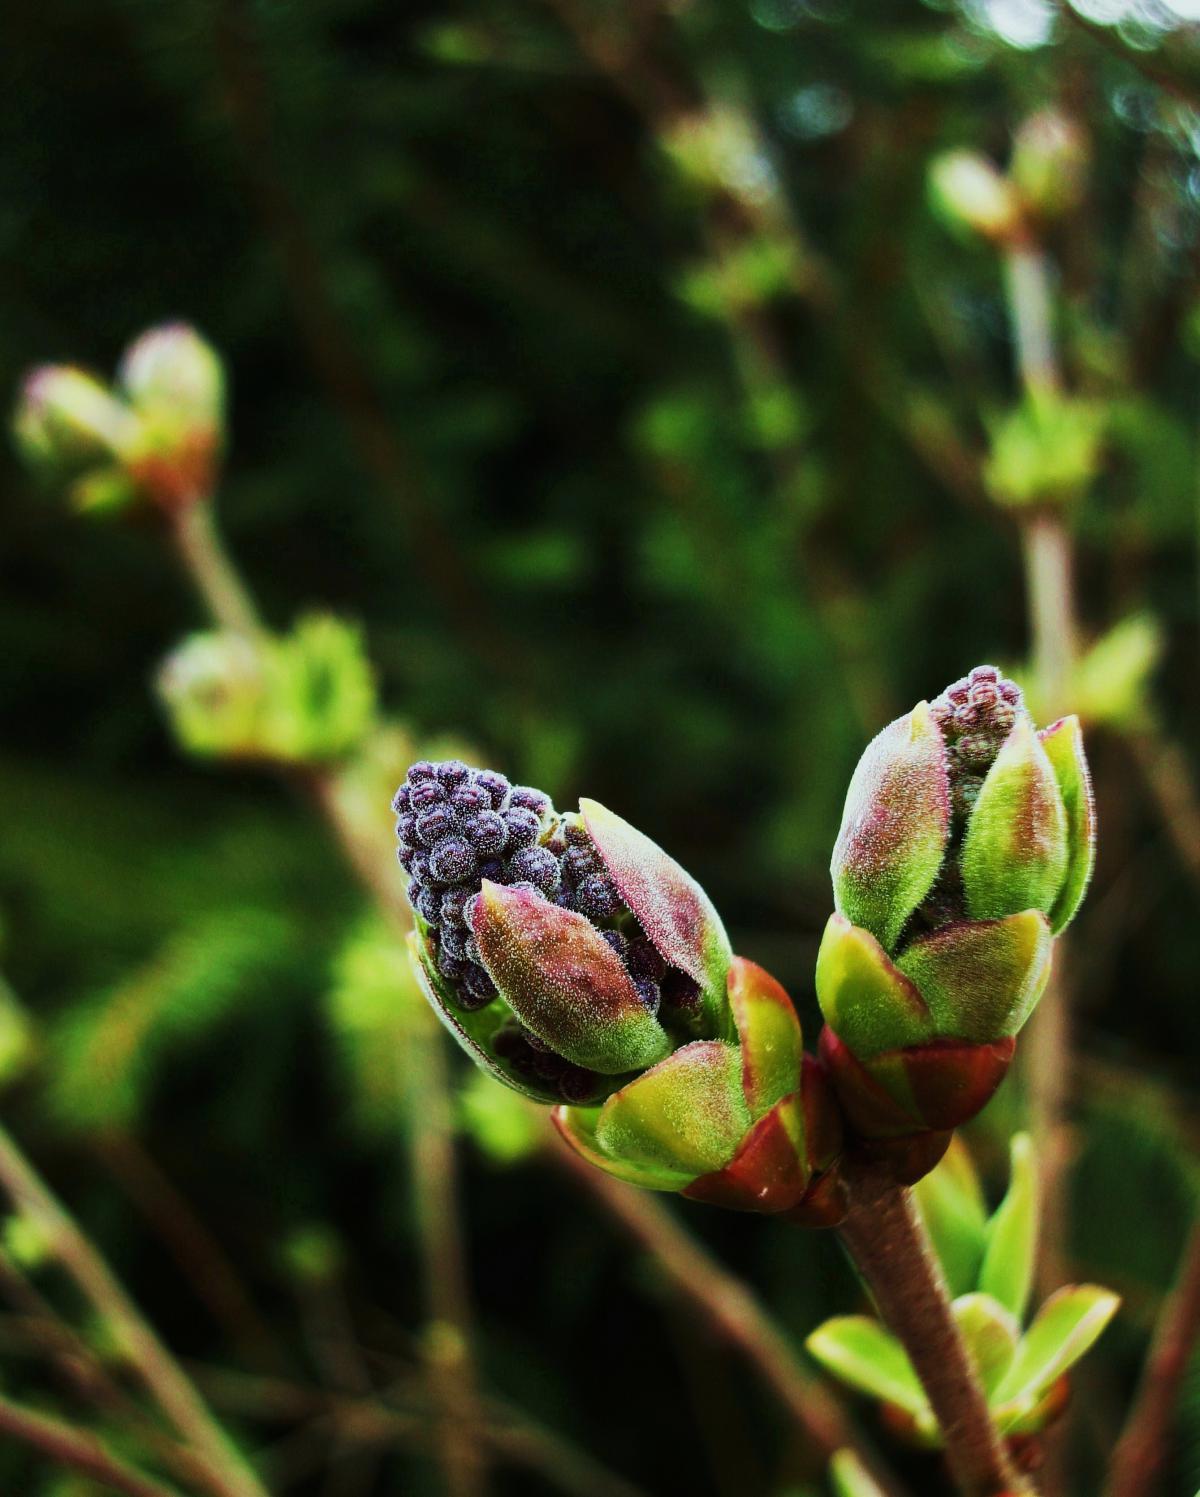 lilac bush in the morning